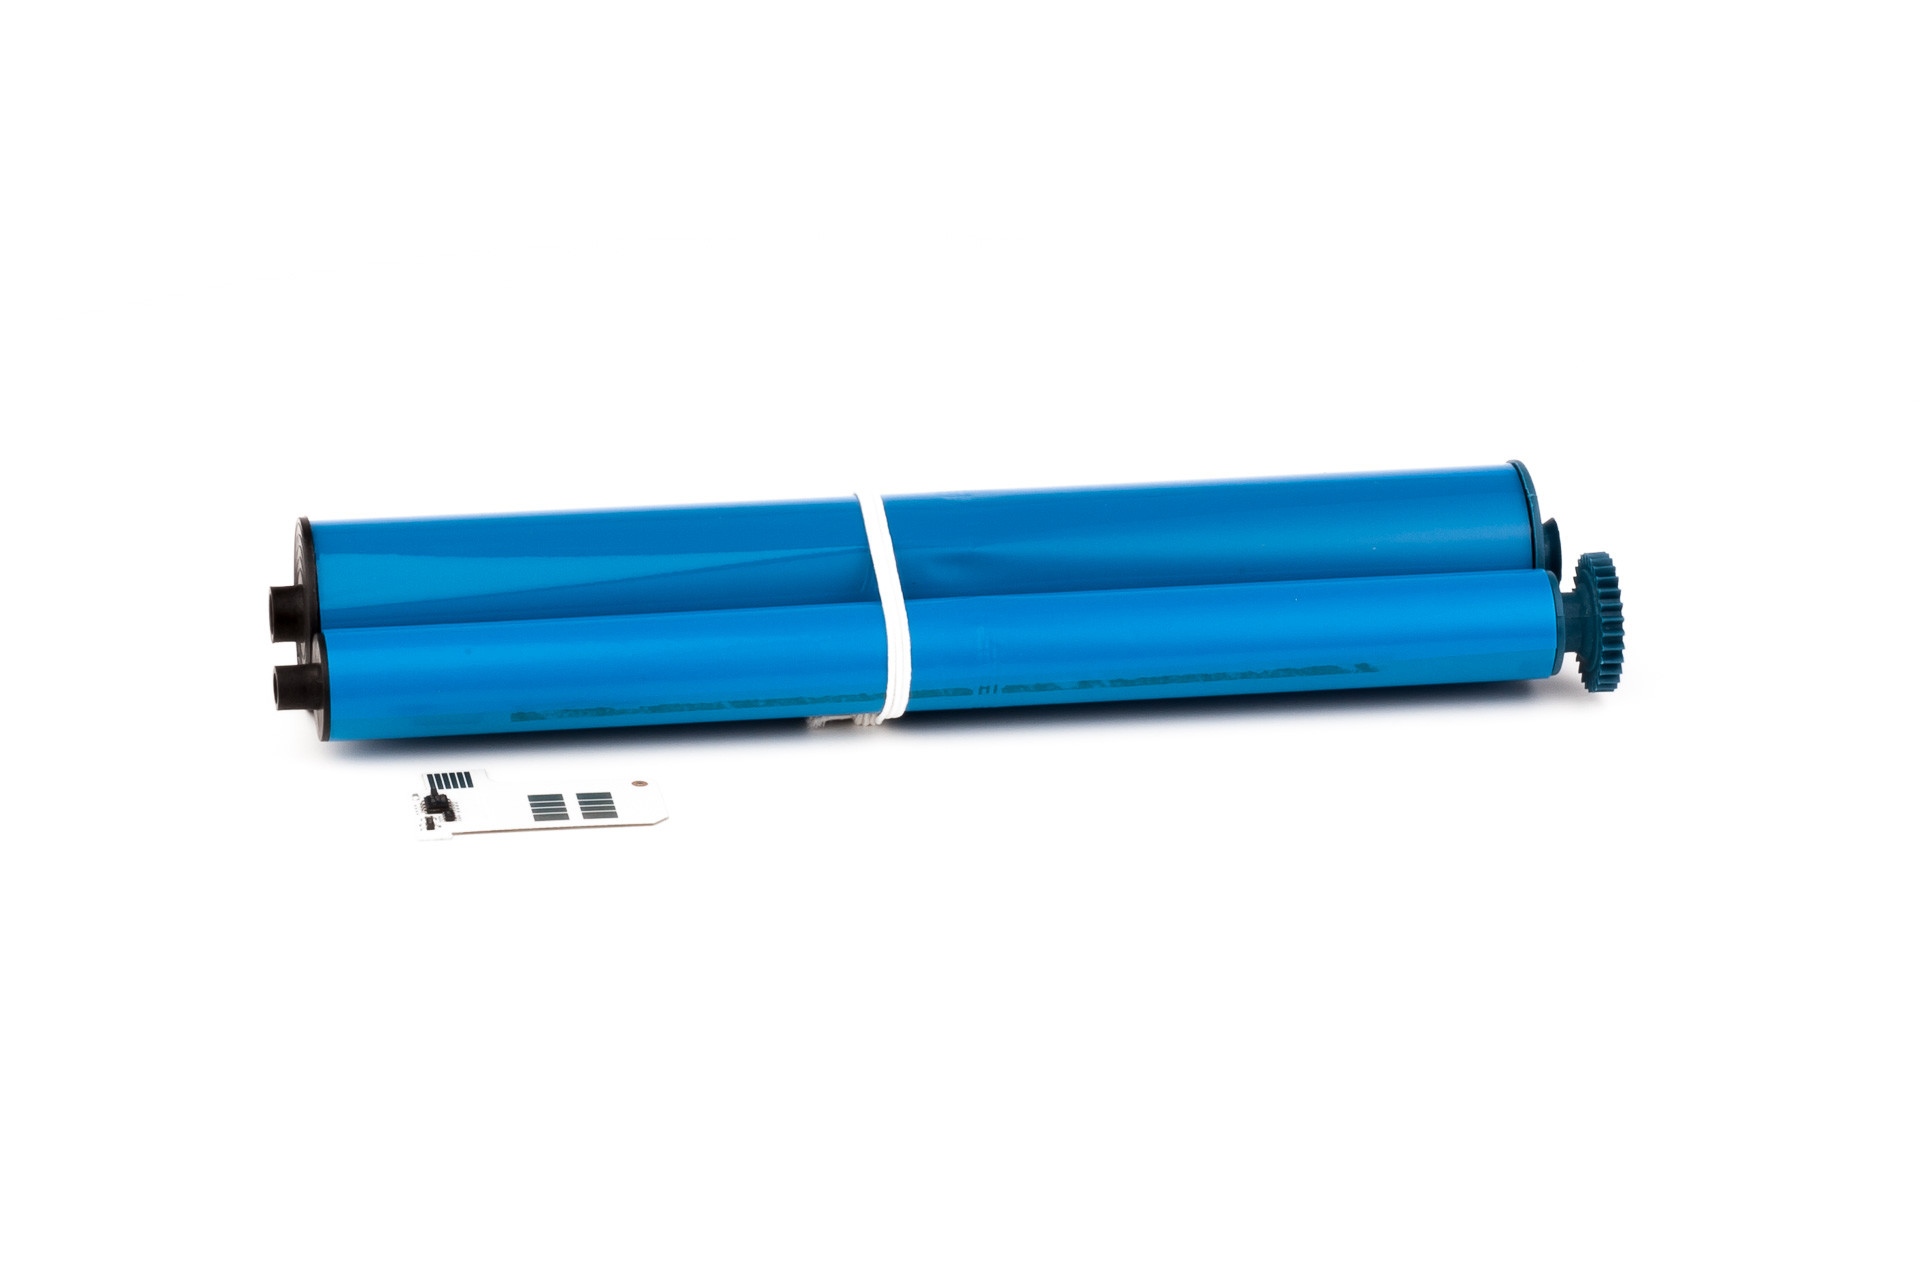 Alternativ-Faxrolle fuer Philips PFA-351 / 252422040